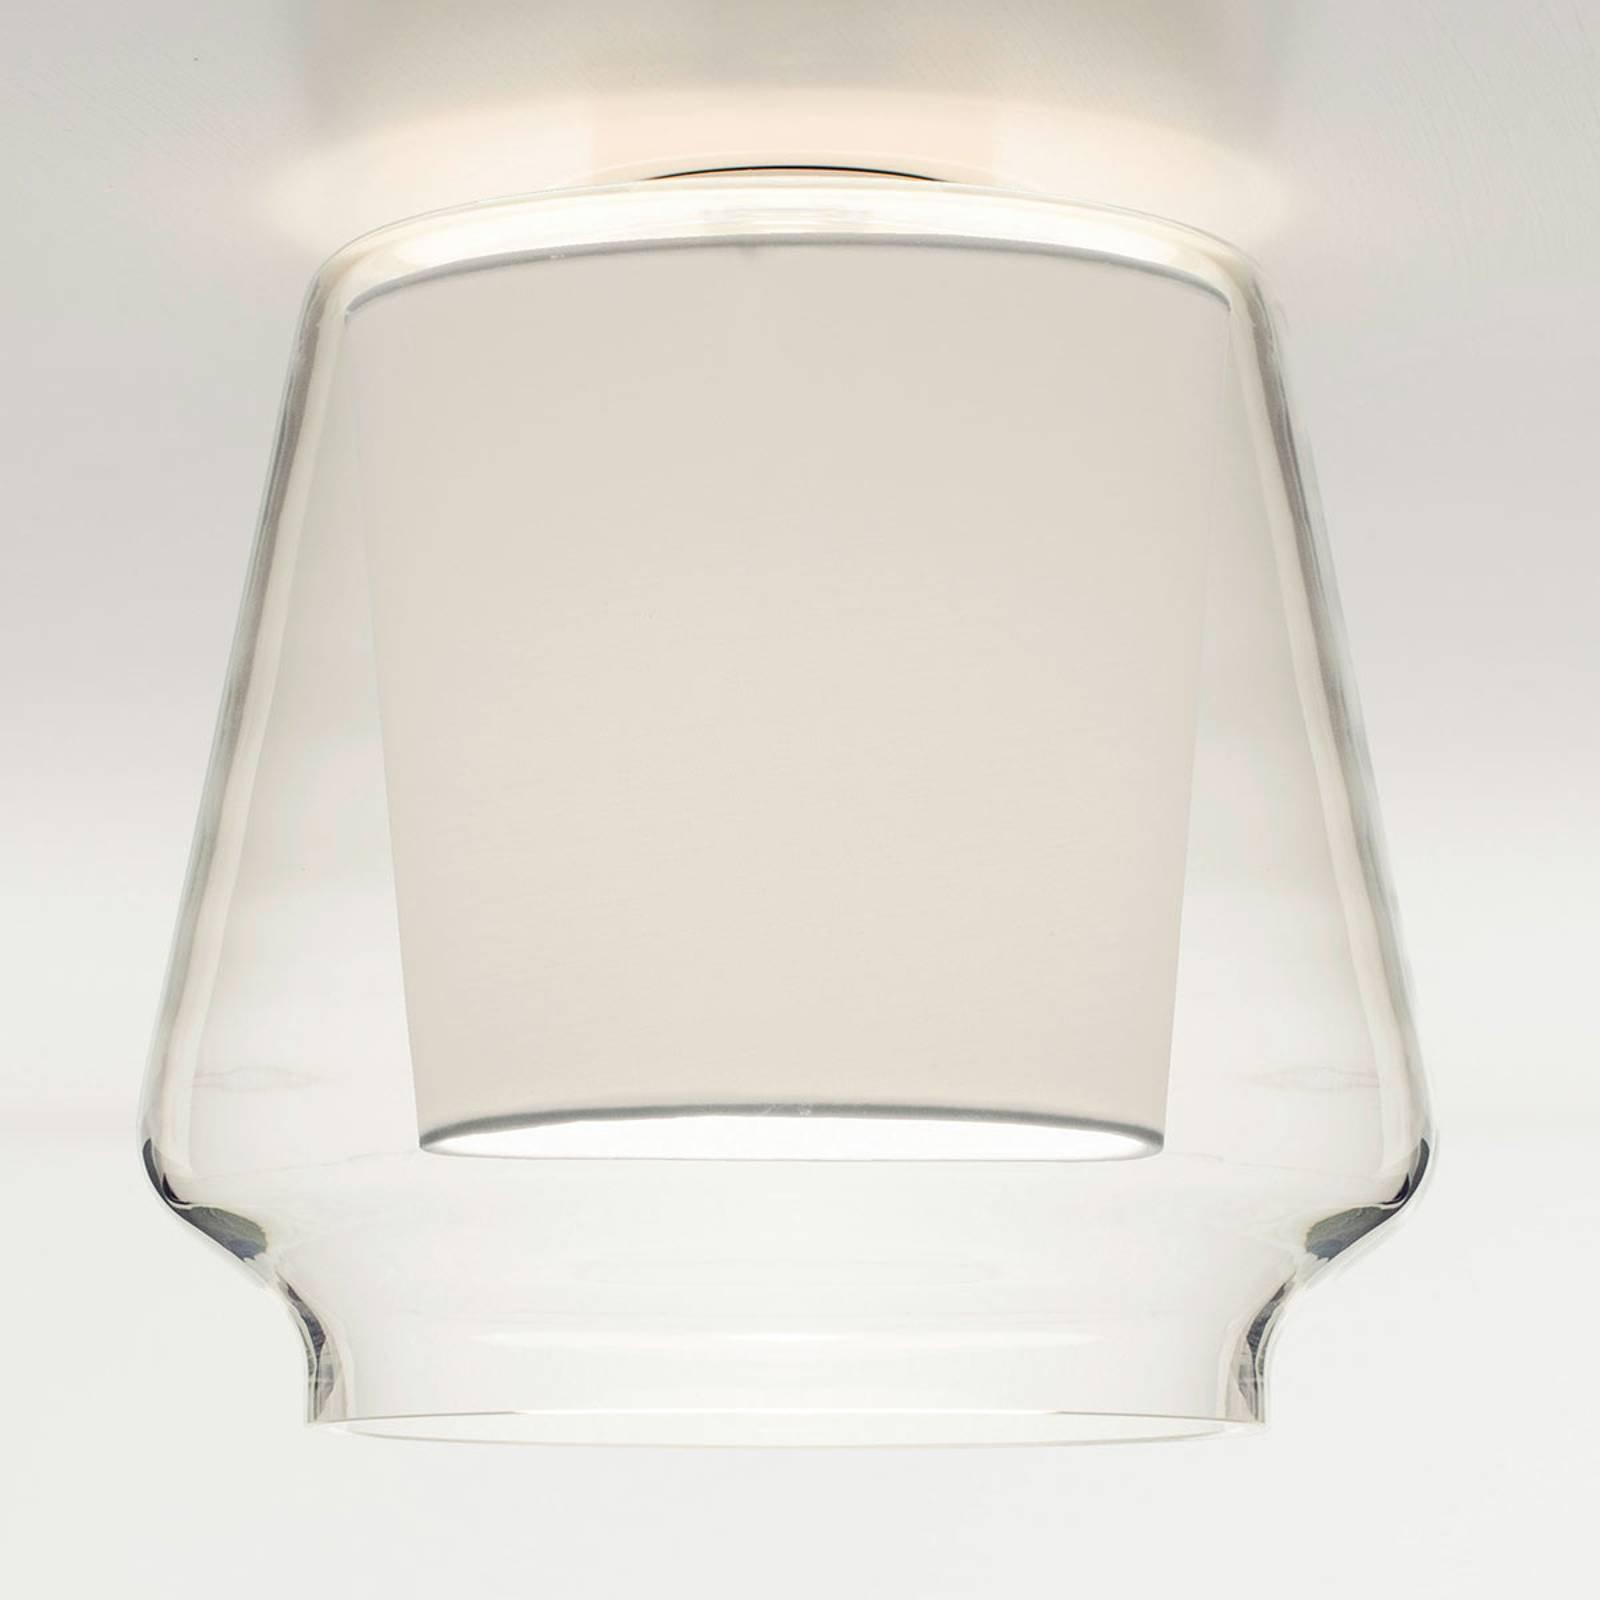 Casablanca Aleve taklampe, klar, hvit